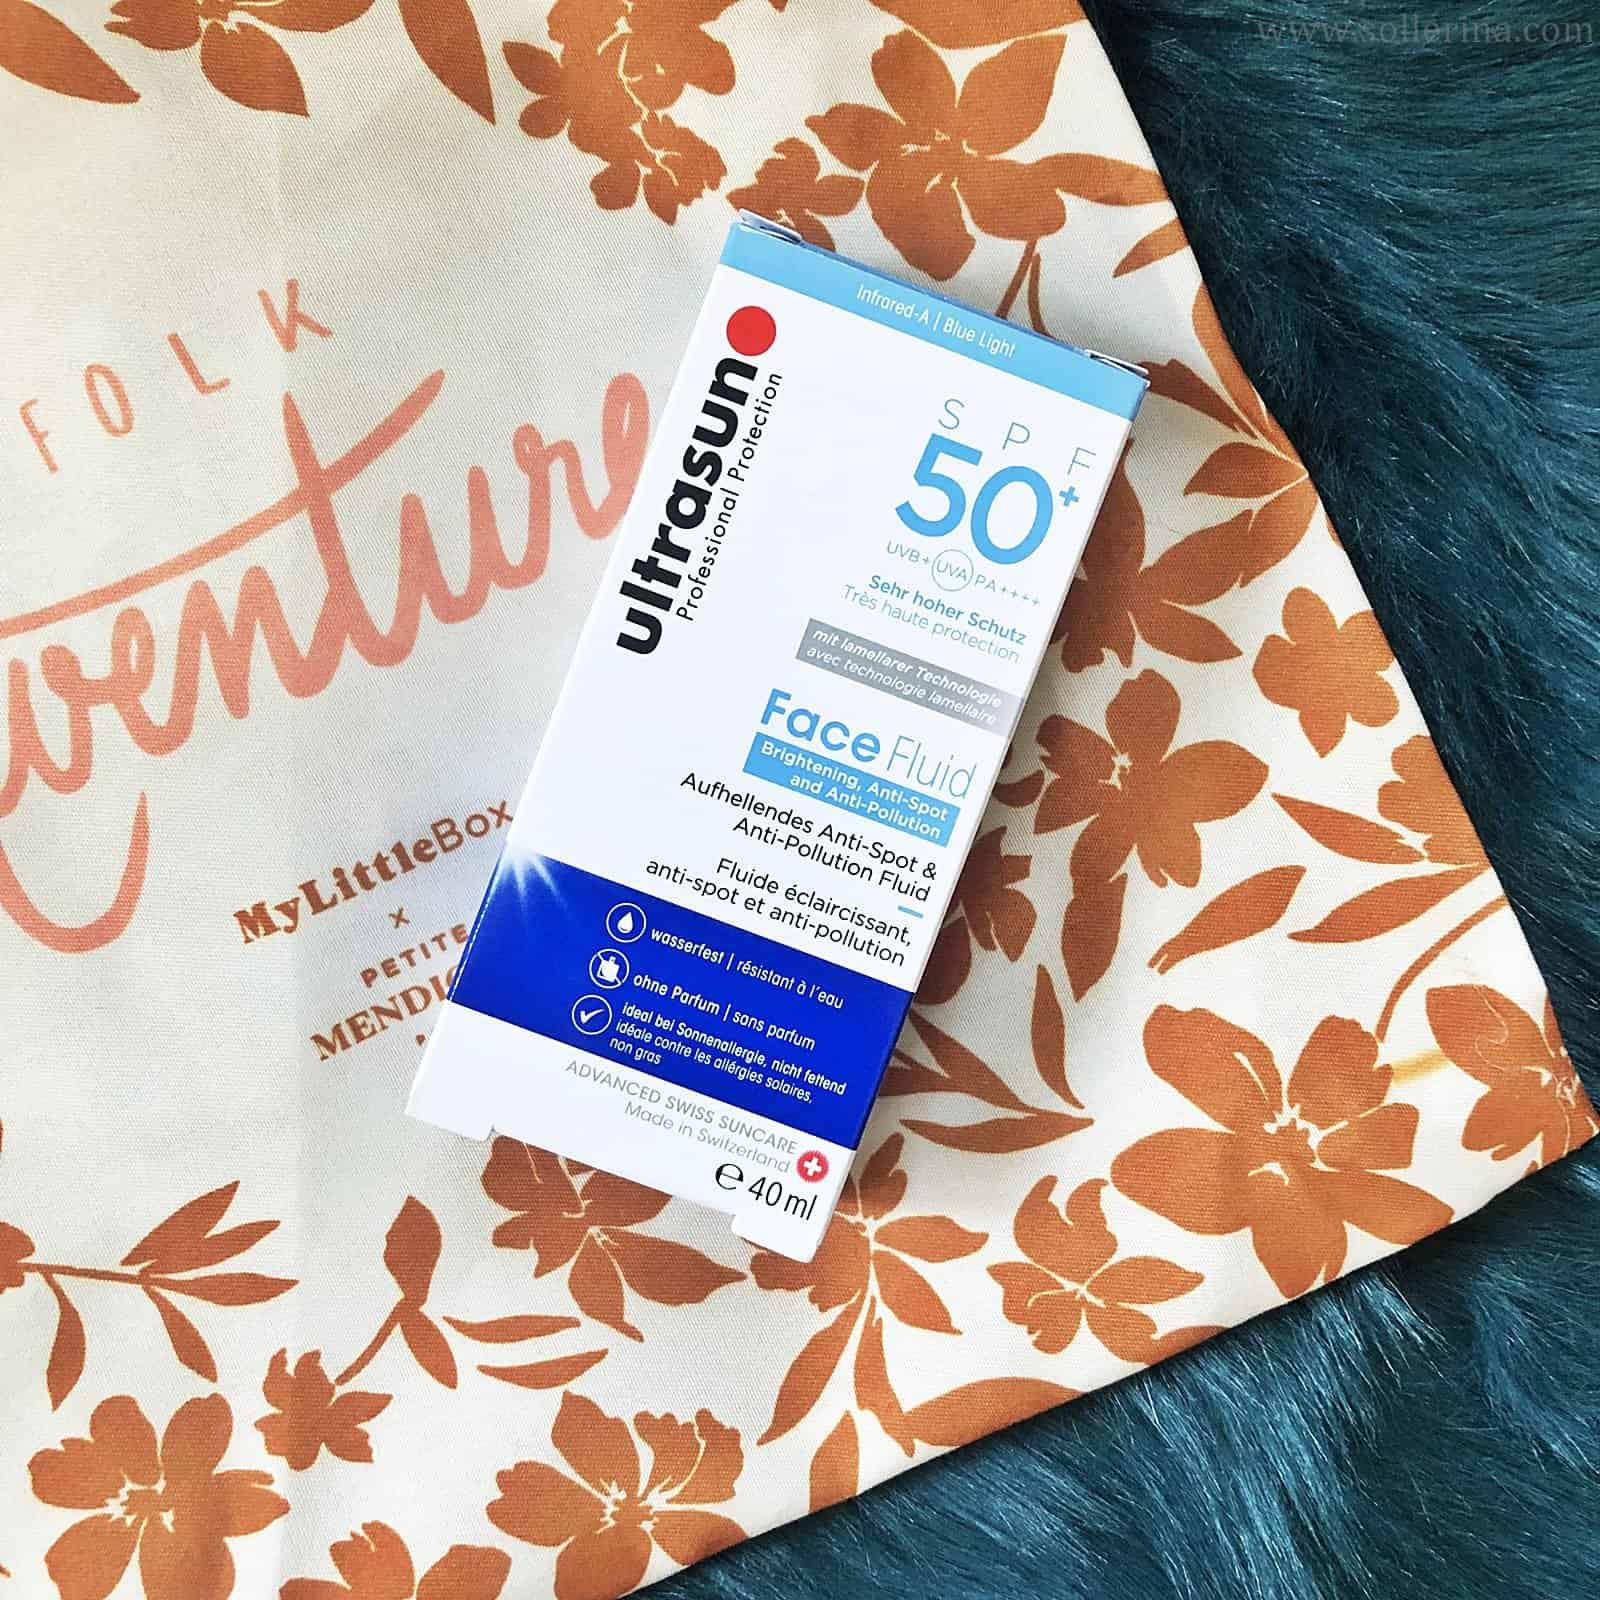 Ultrasun Professional Protection – Face Fluid SPF 50+